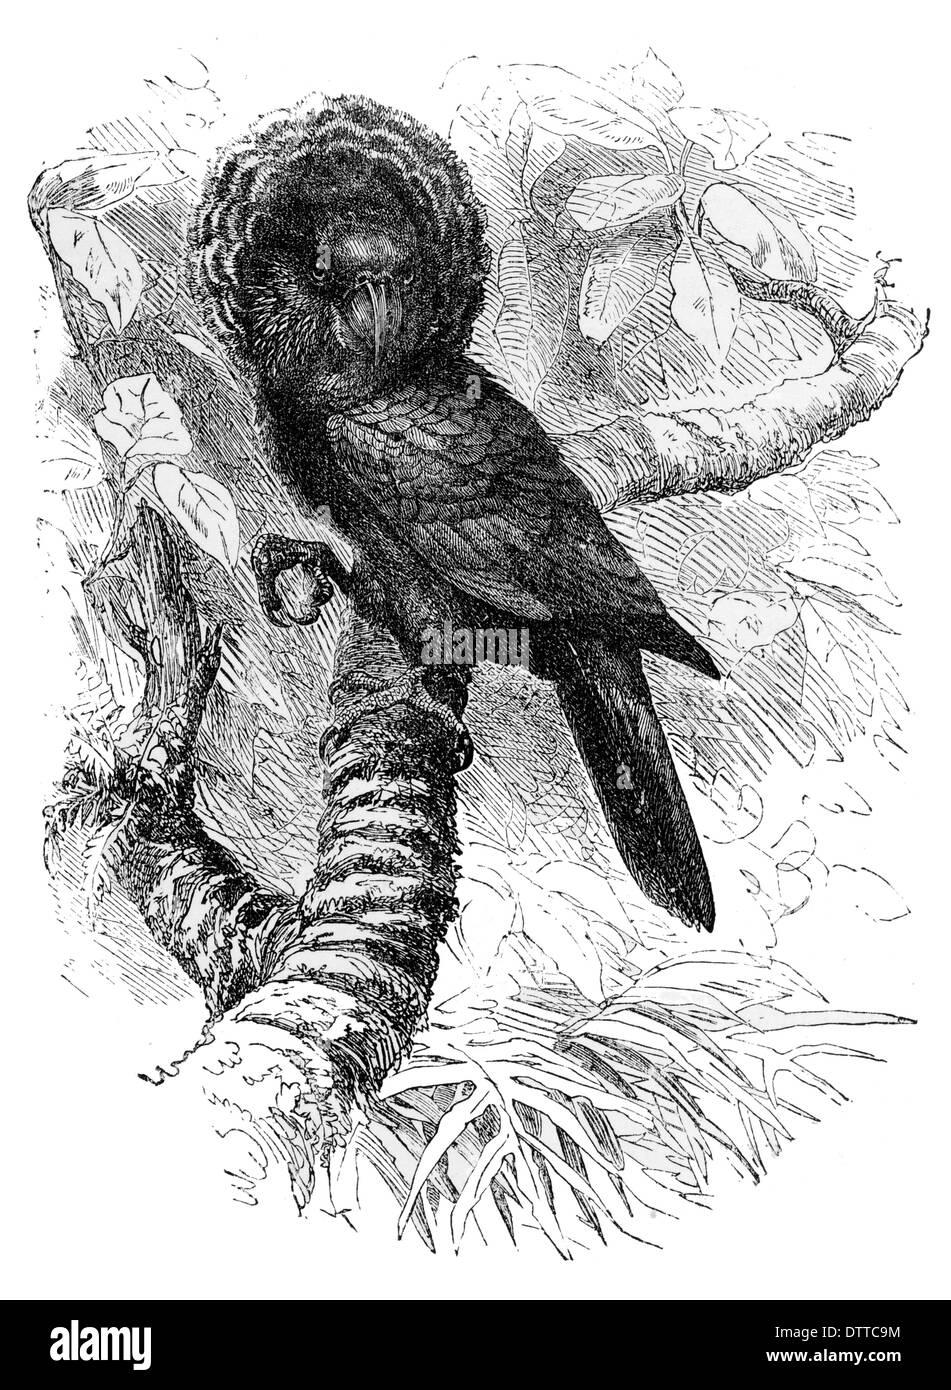 Crested Hawk Parrot Deroptyus accipitrinus coronatus - Stock Image